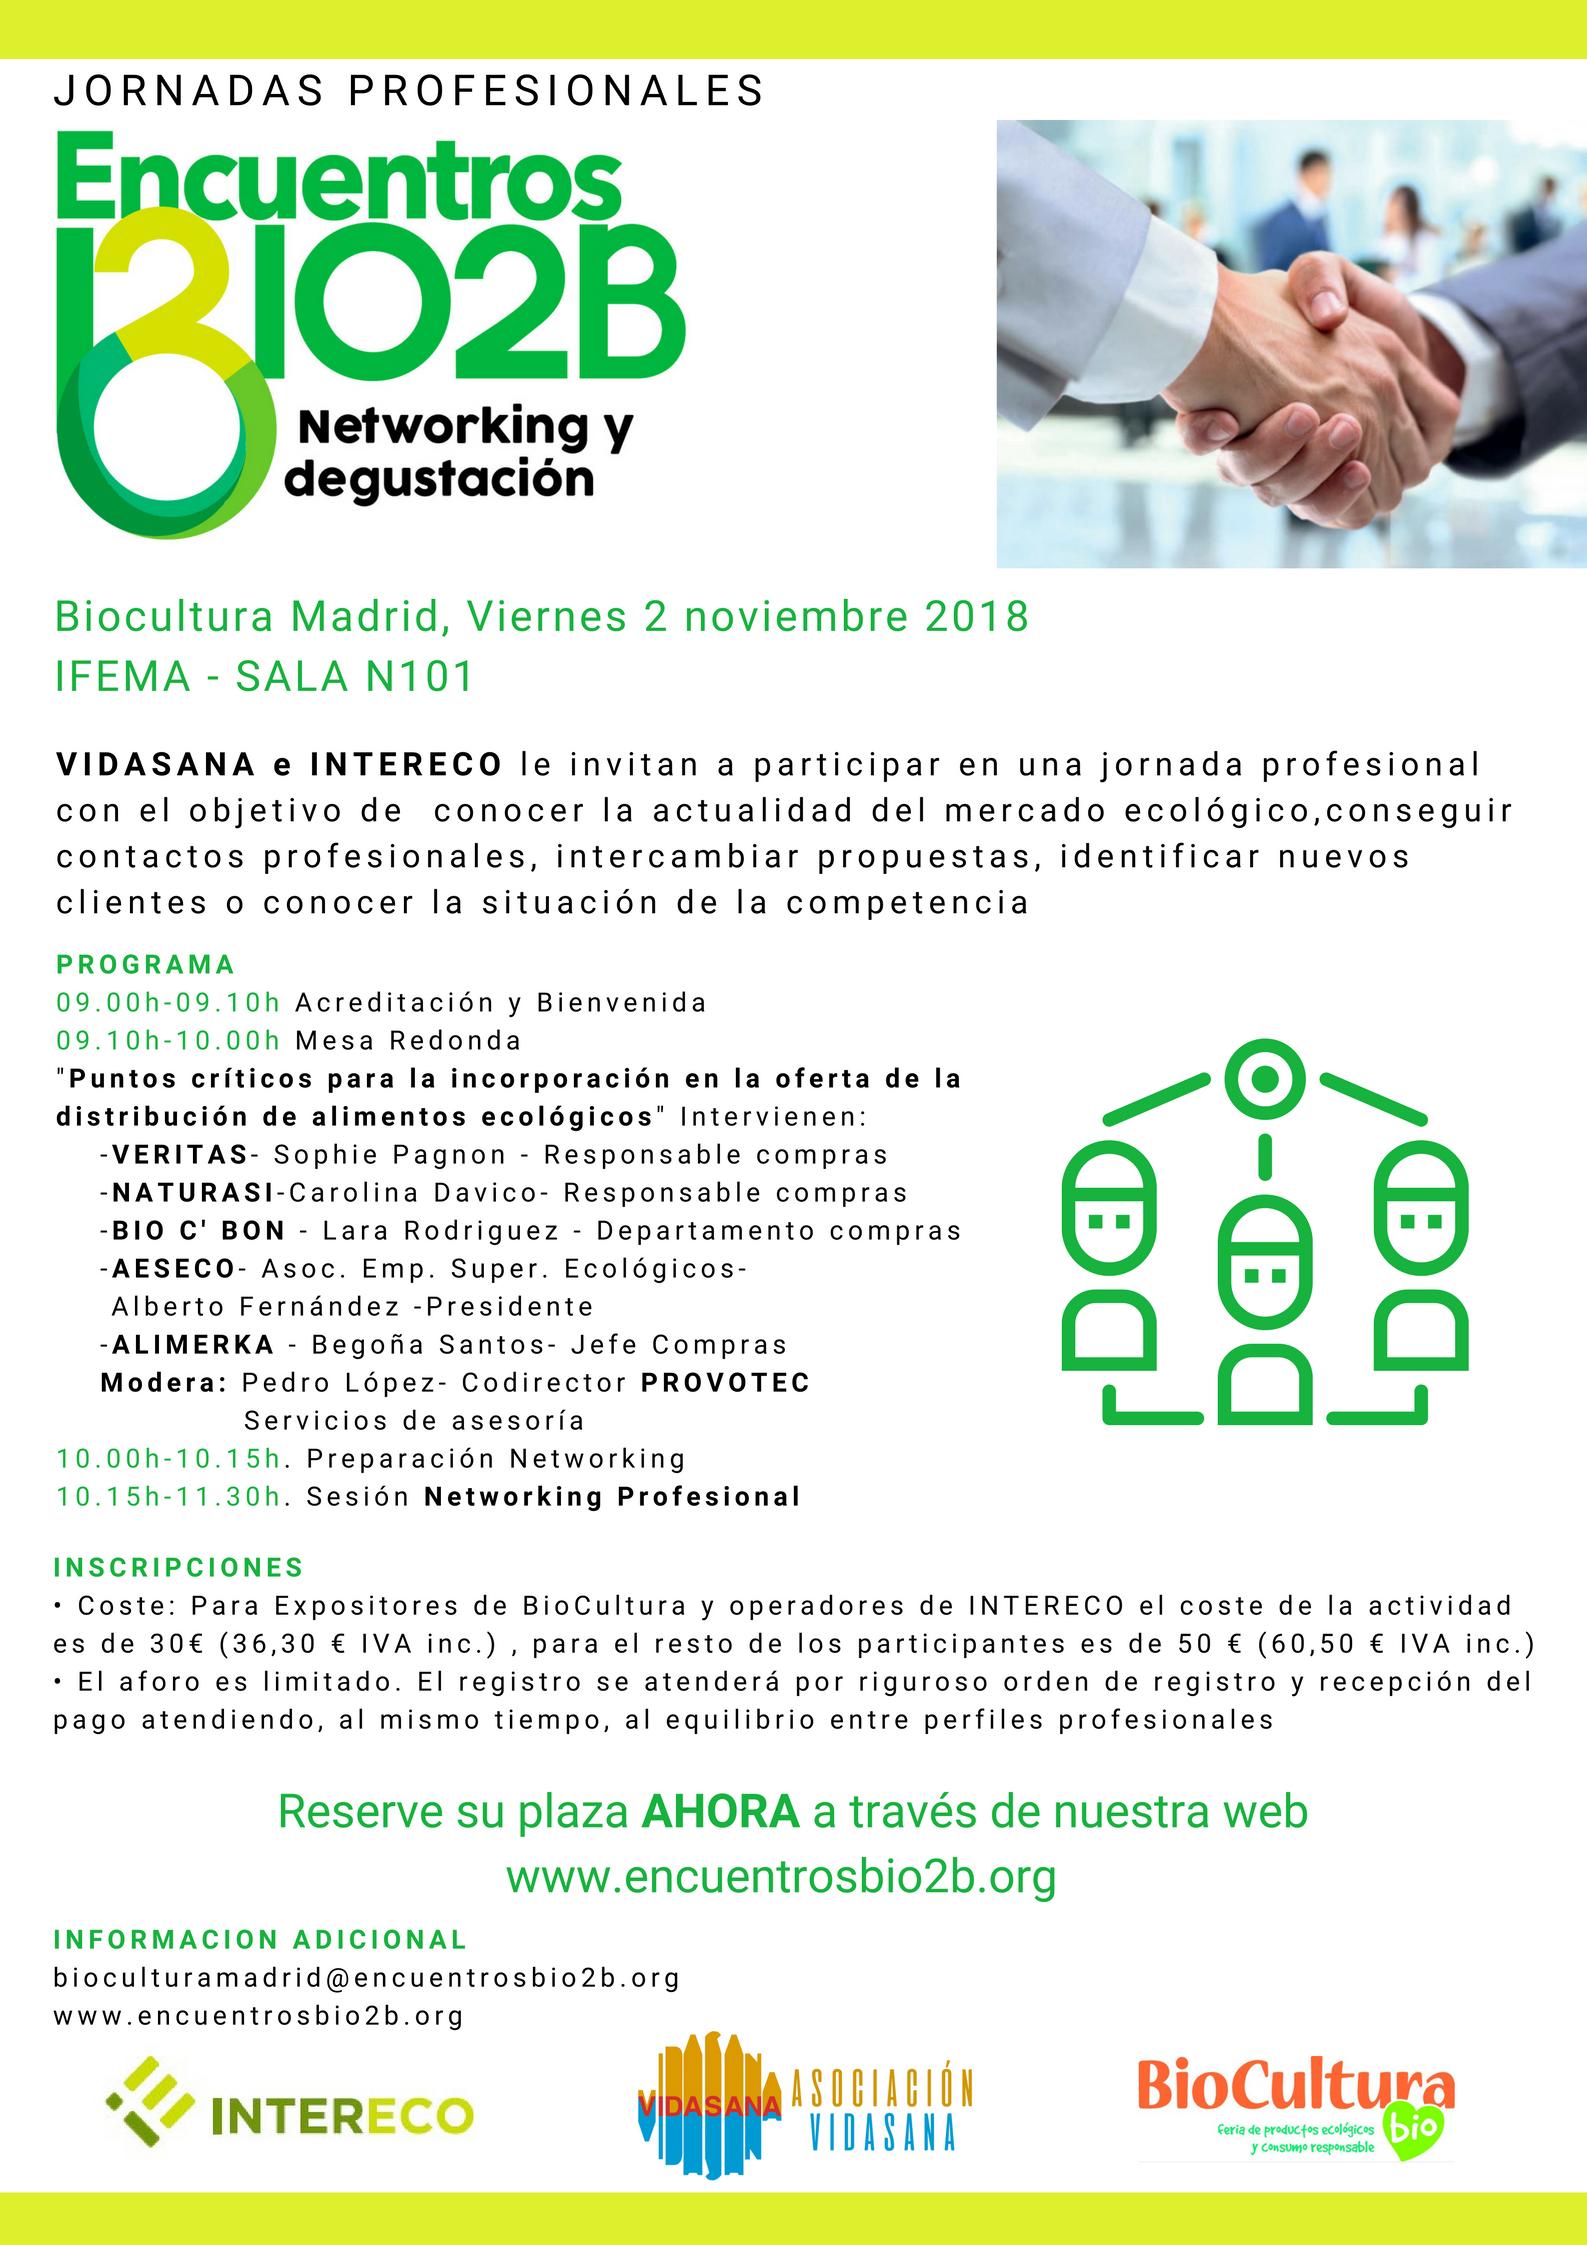 BioCultura Valencia 2019, cita con la cultura ecológica del 2 al 4 de marzo